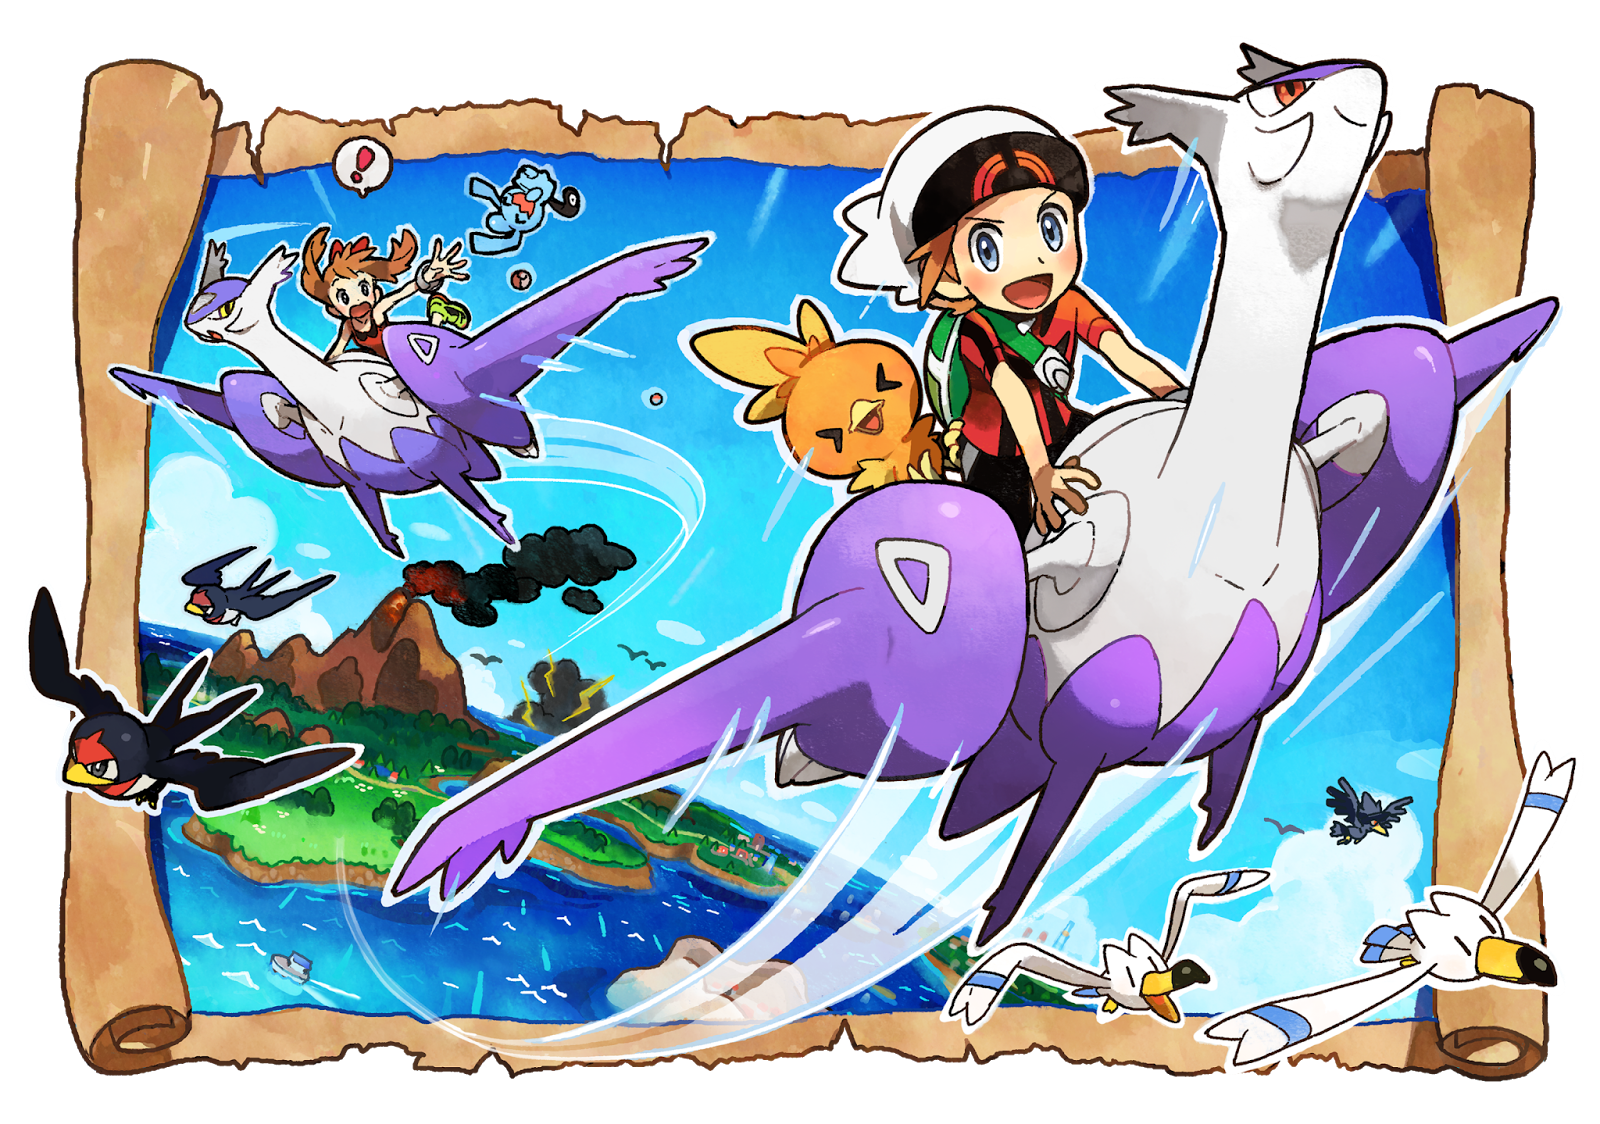 pokémon omega ruby and alpha sapphire   pokémon wiki   fandom